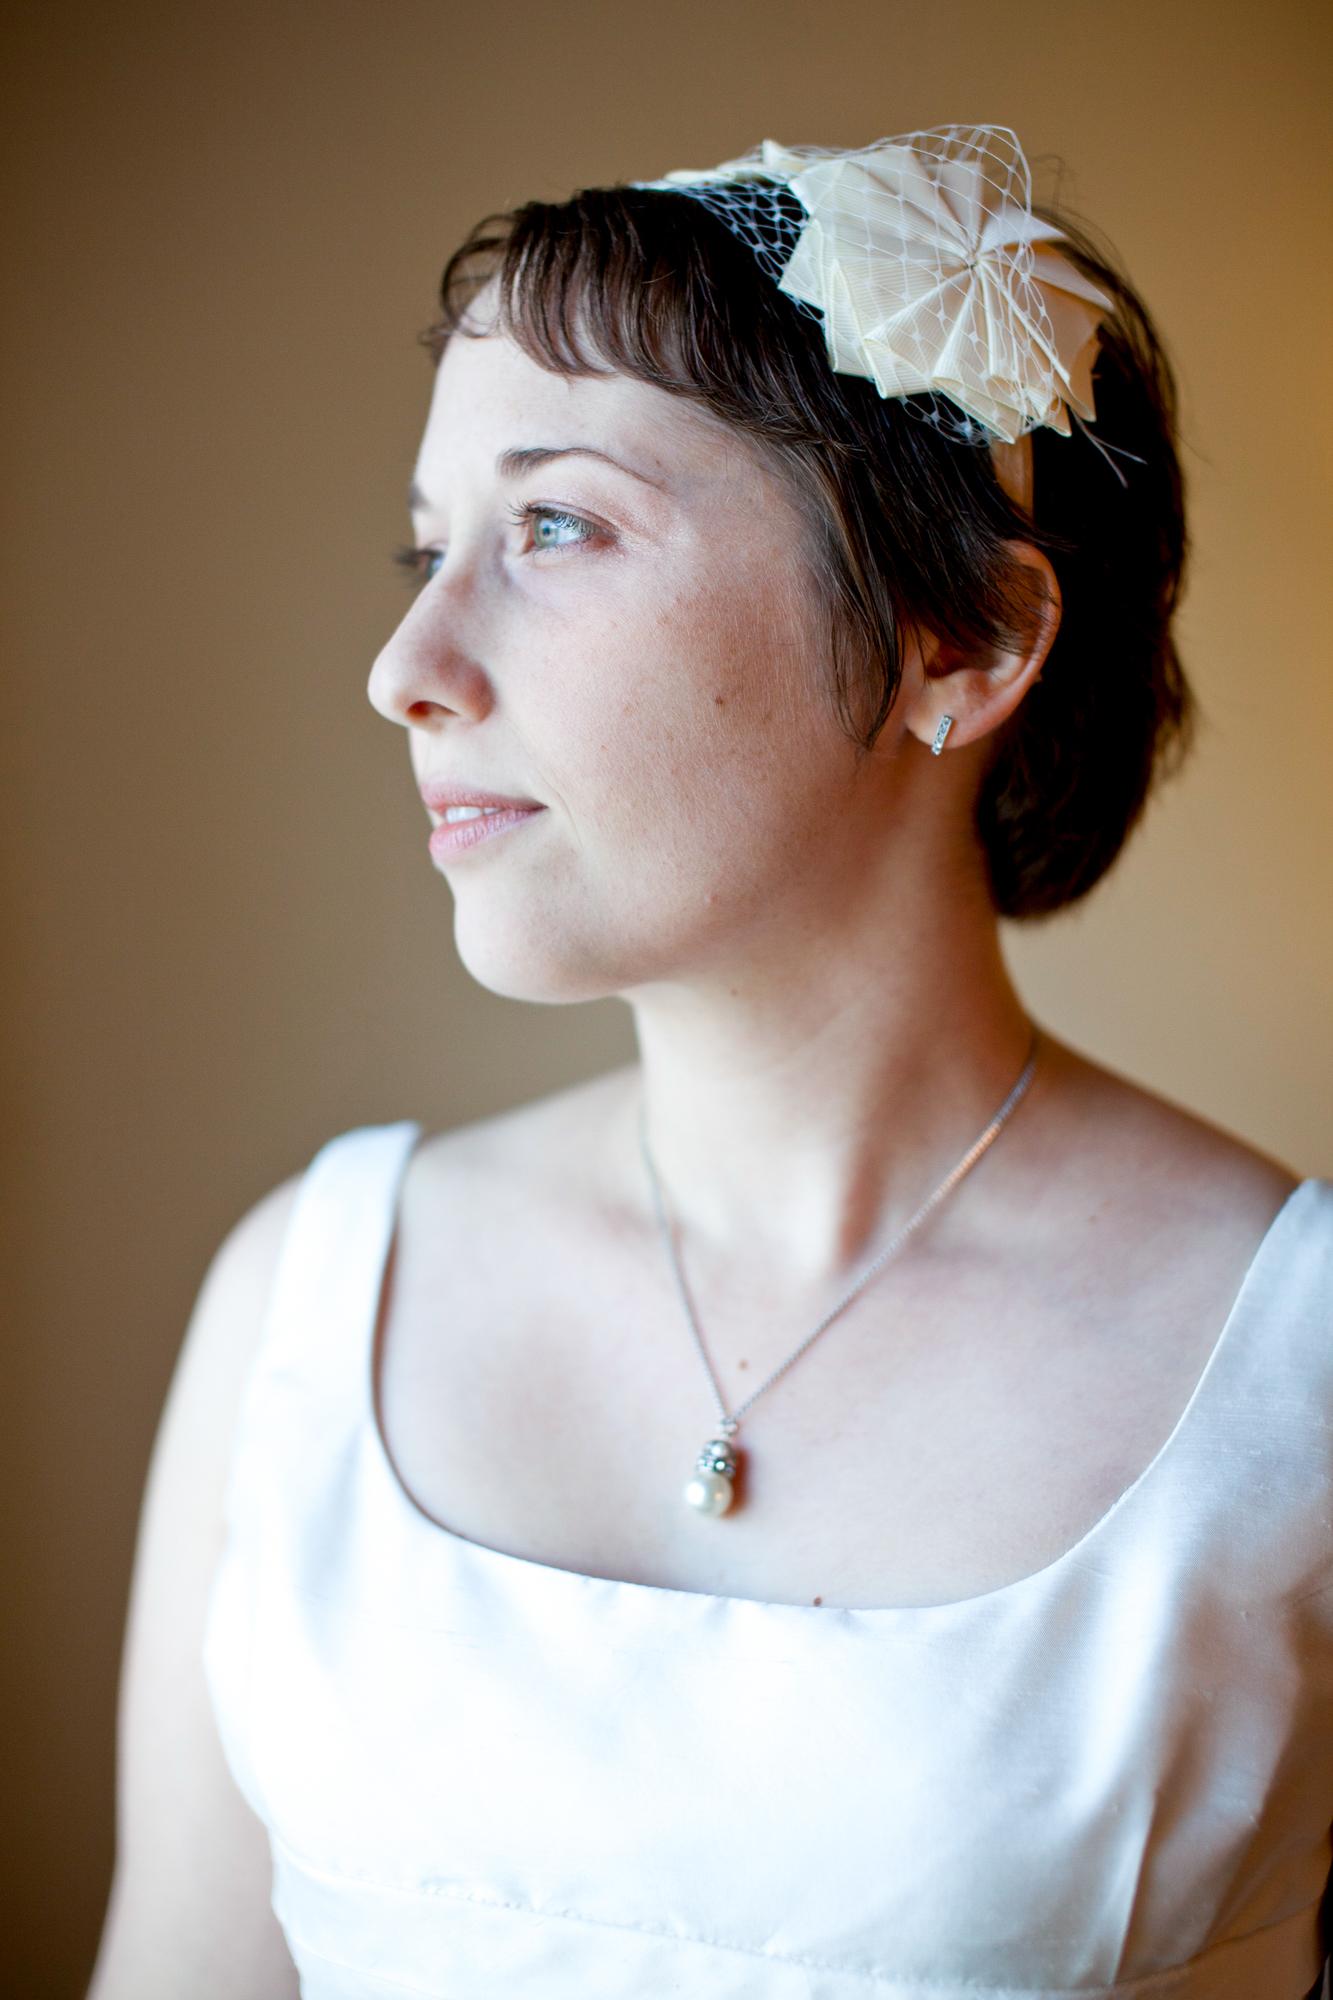 127_CarlyGaebe_SteadfastStudio_WeddingPhotography_NewYork_Ithaca_Bride_Veil.jpg